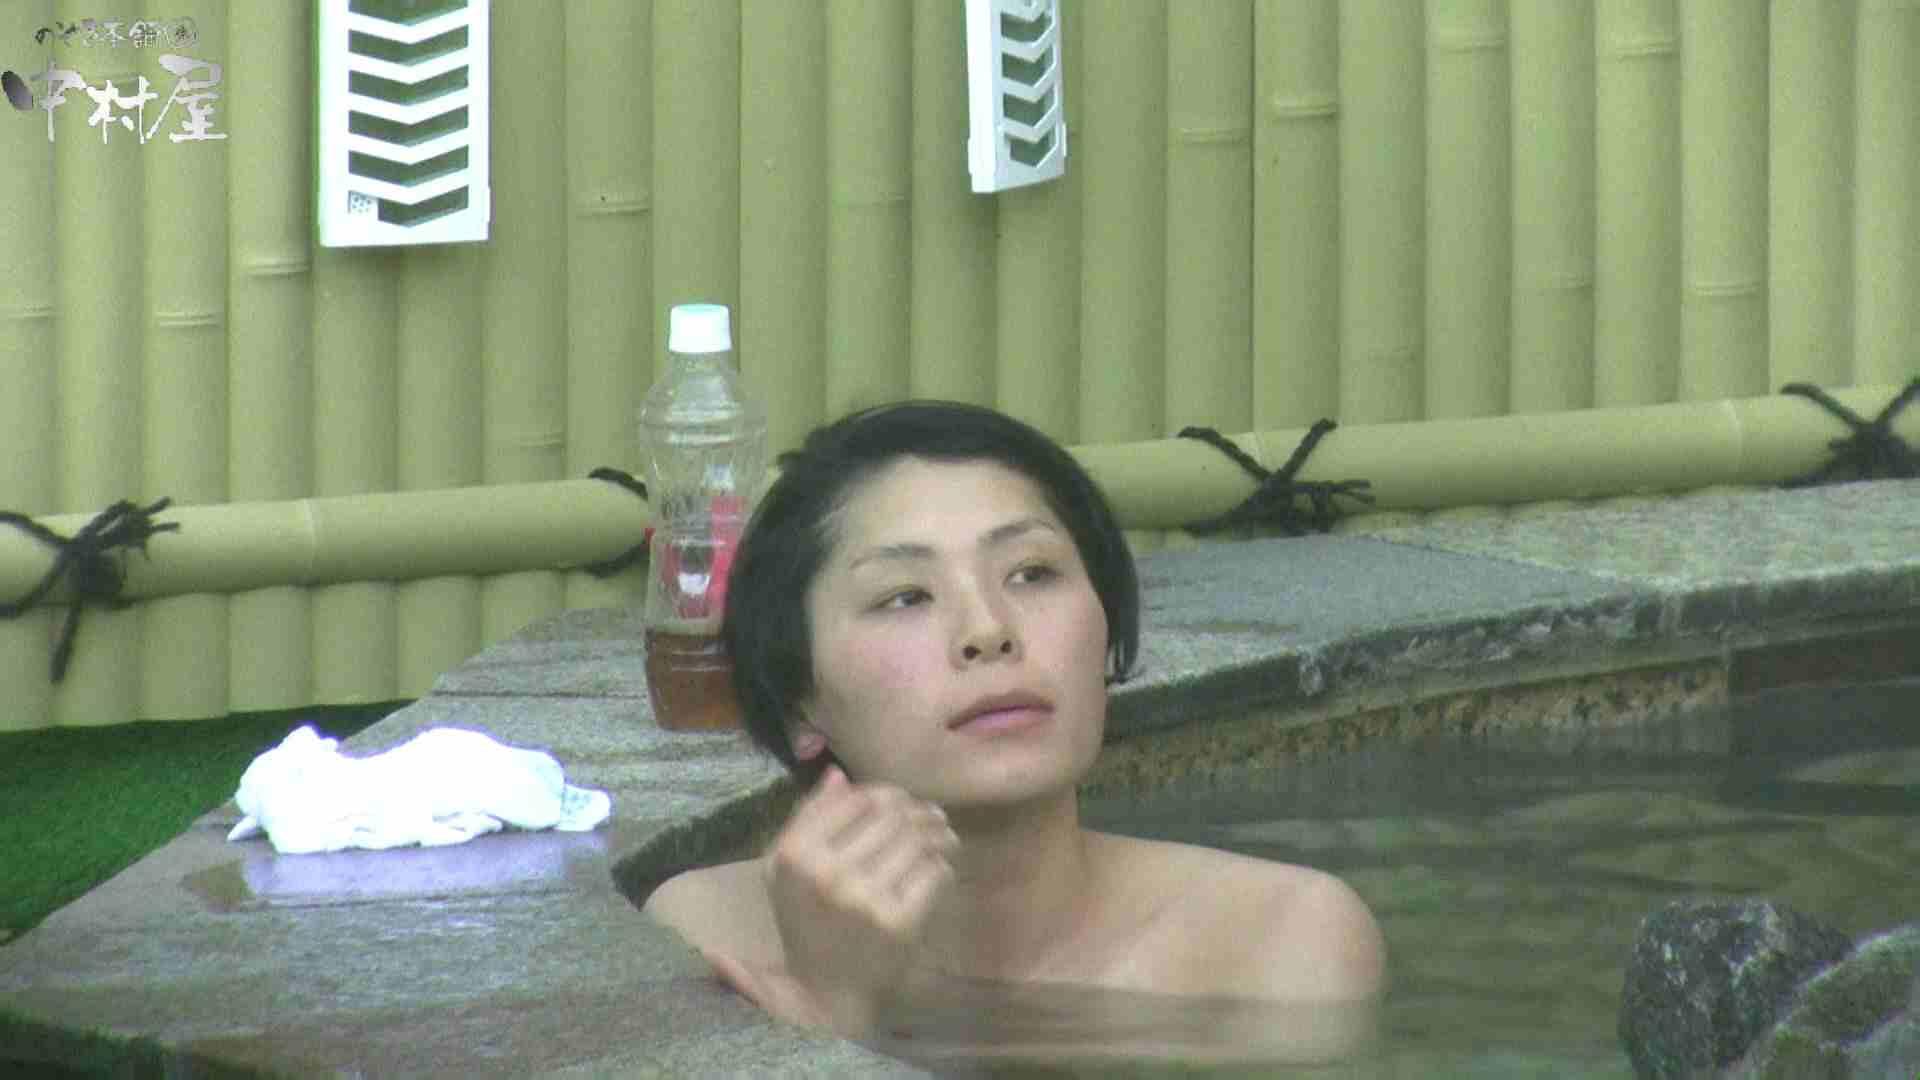 Aquaな露天風呂Vol.970 OL  59連発 5